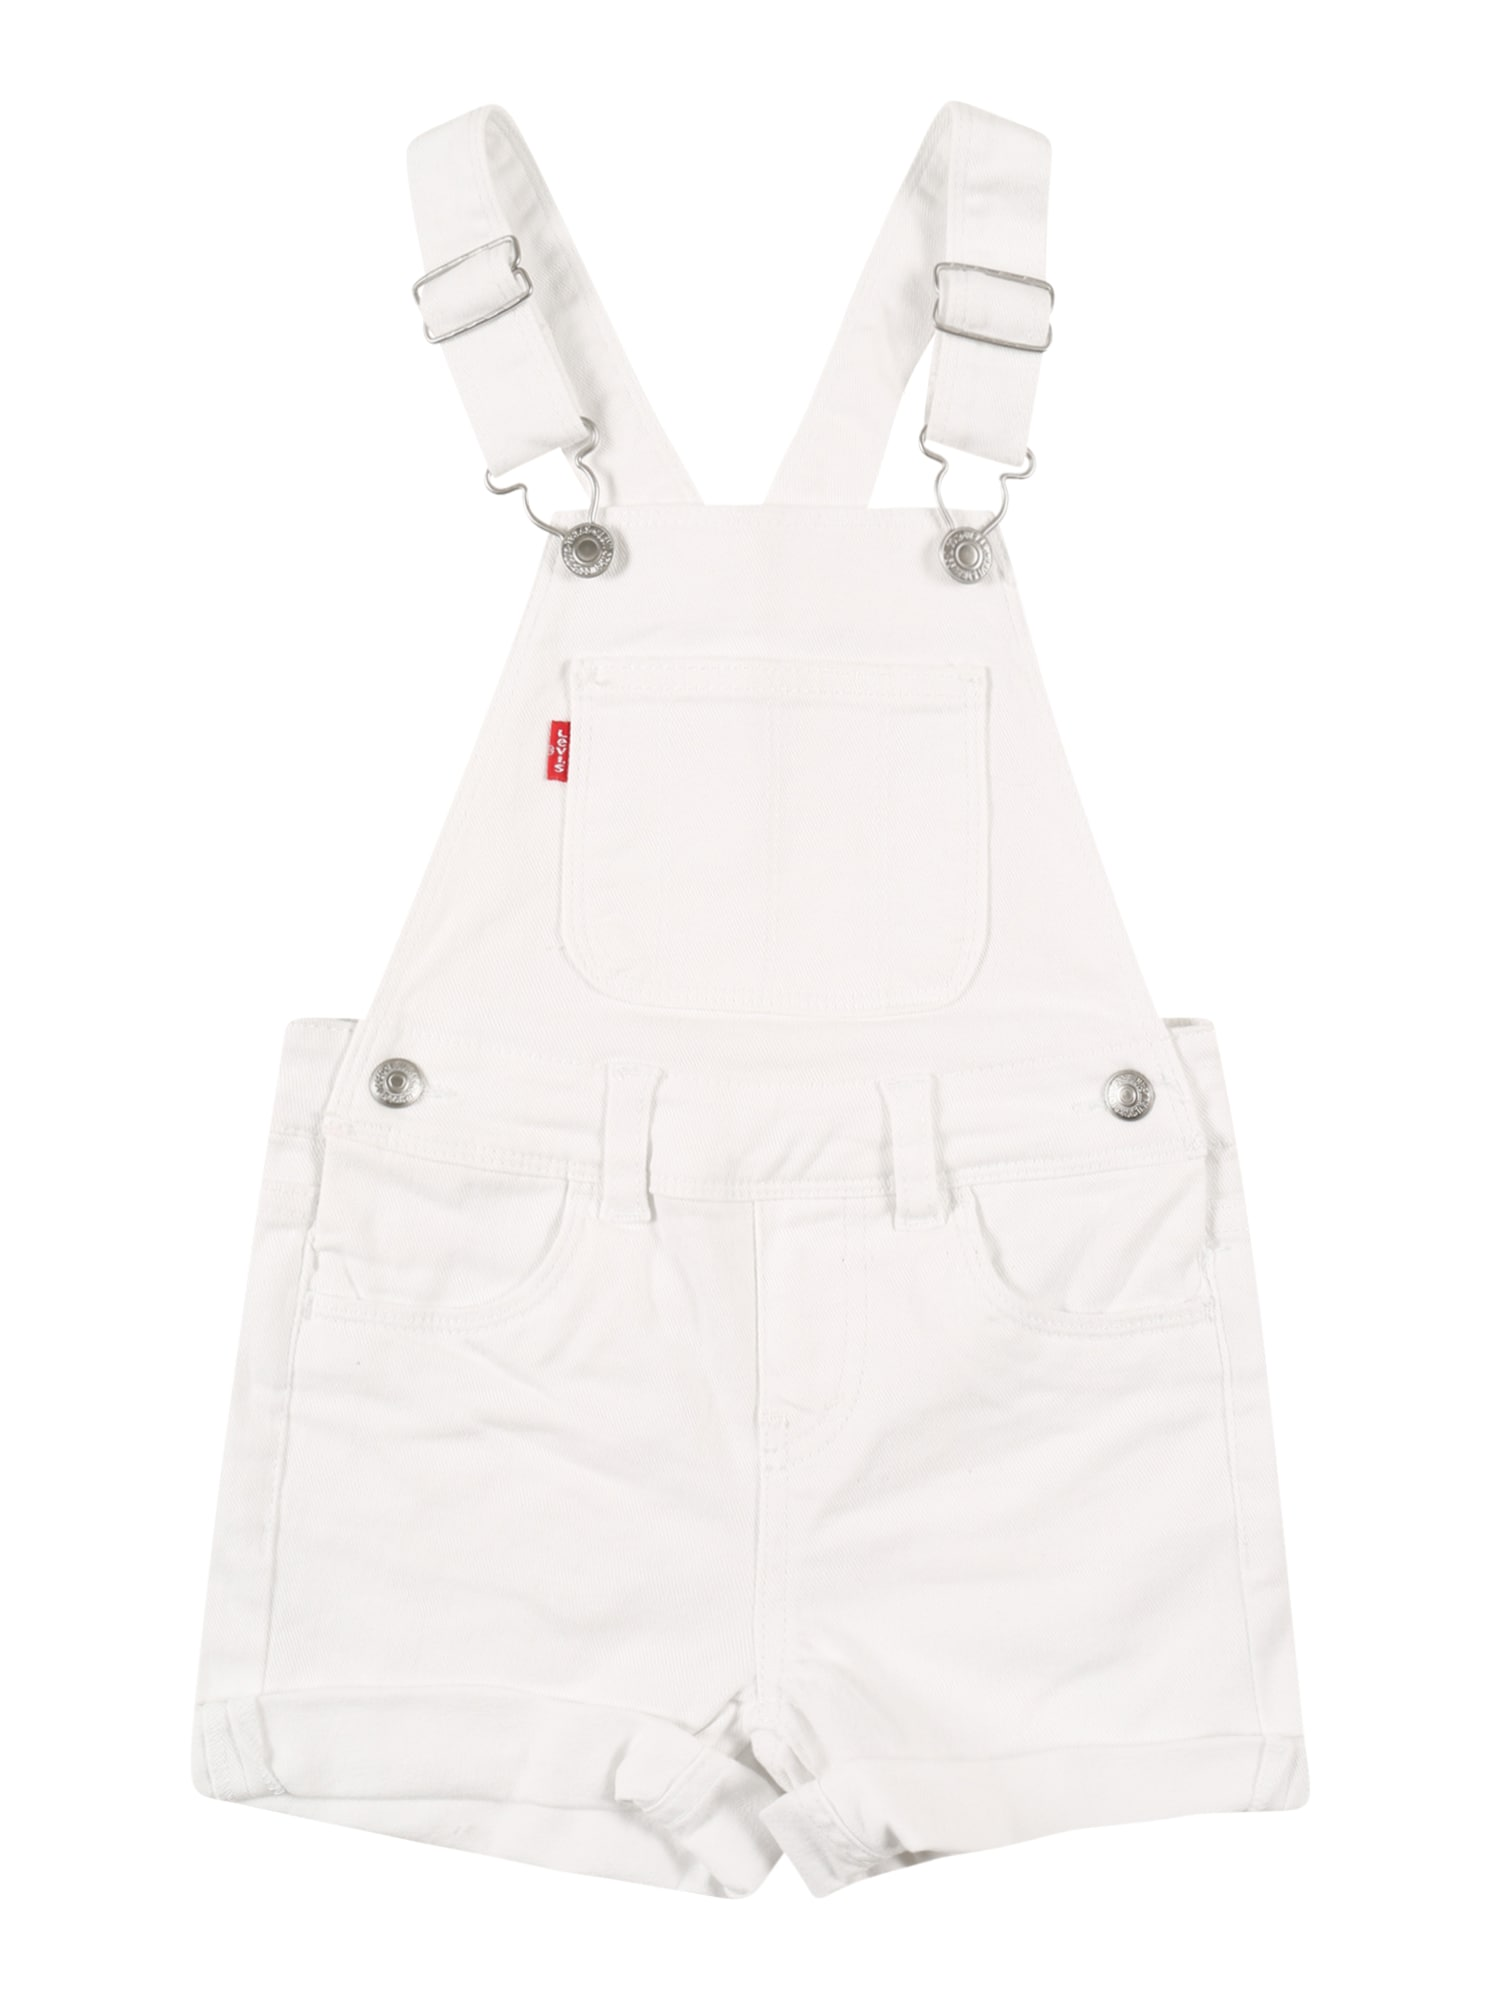 LEVI'S Laclové kalhoty  bílá